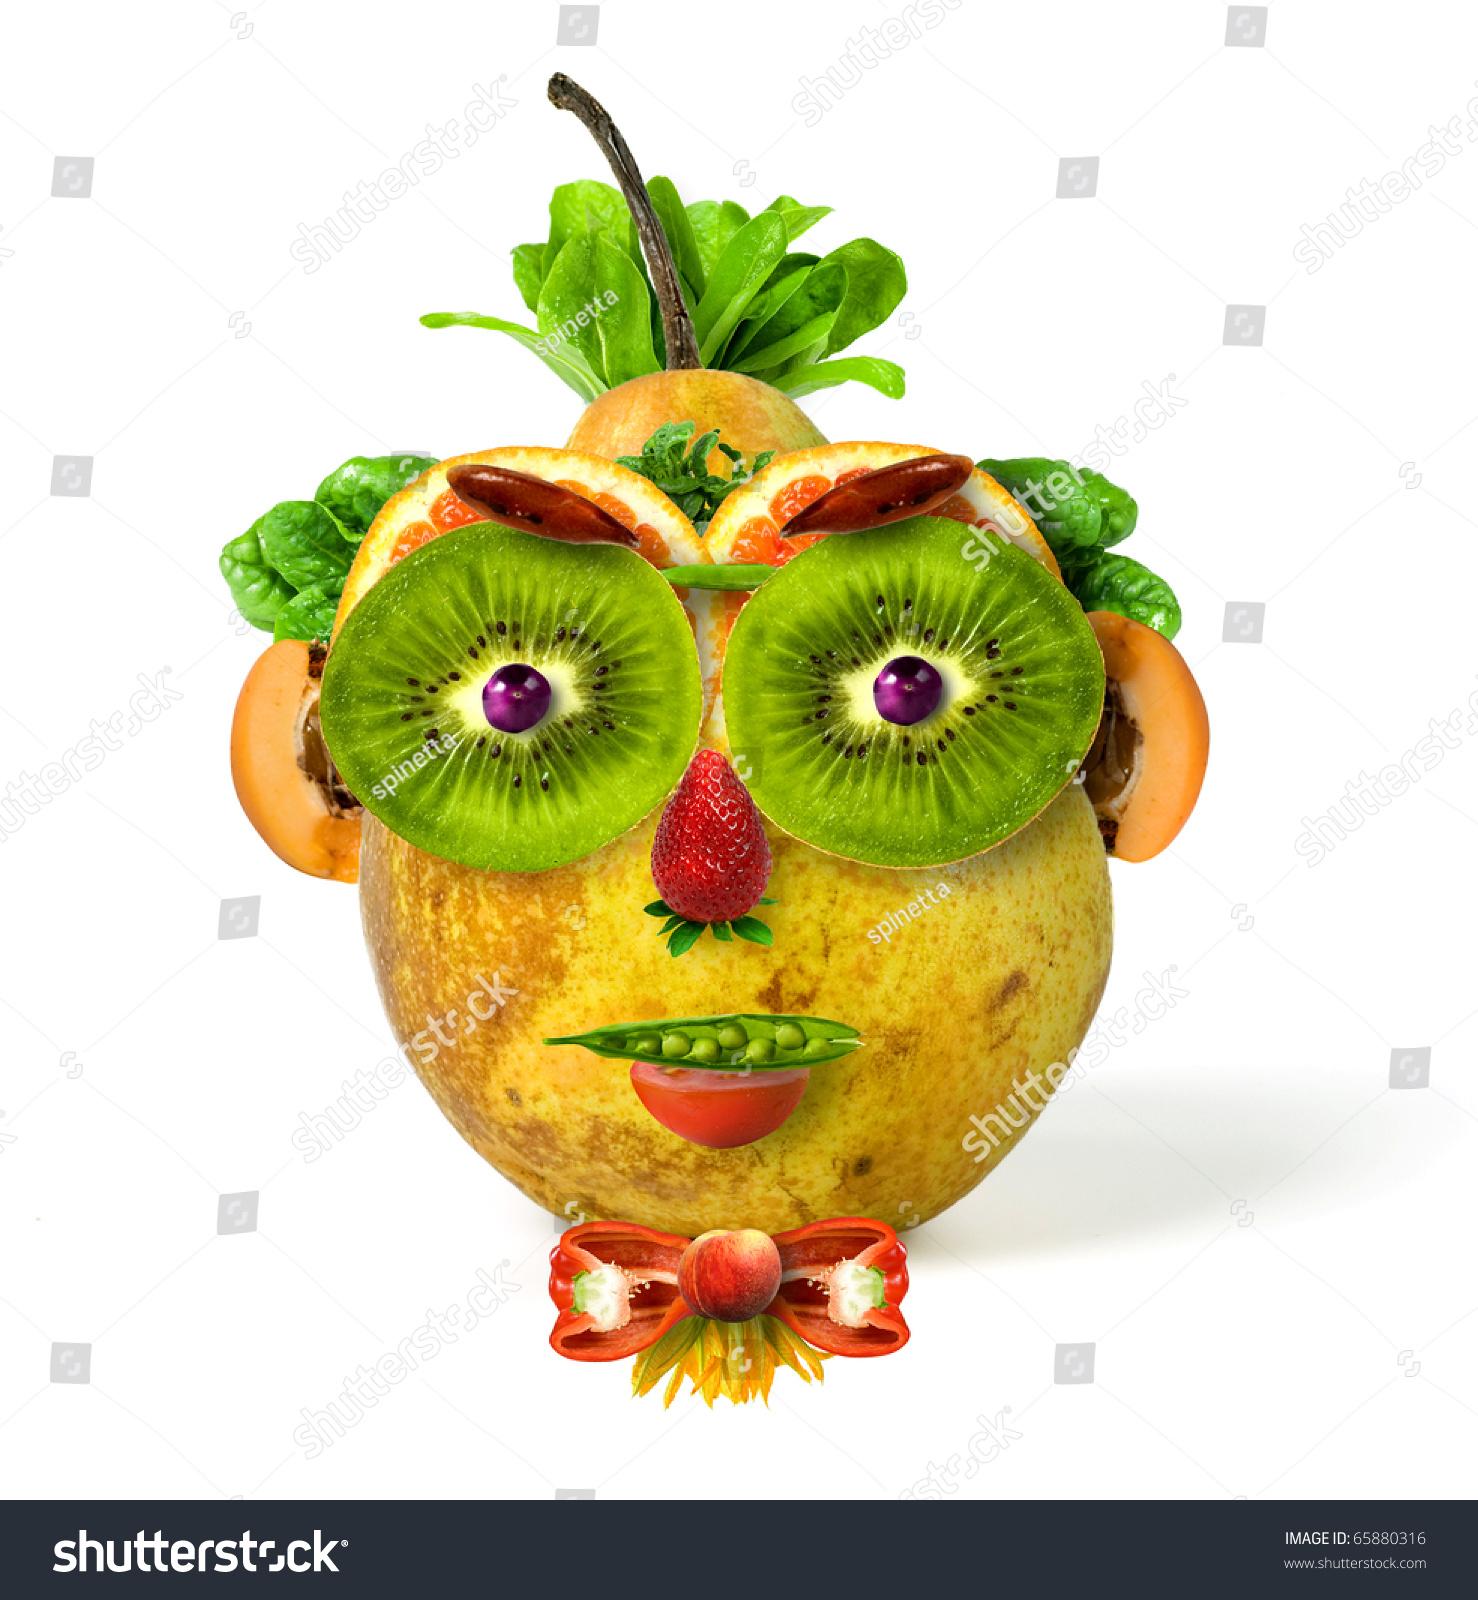 Porompompero Fruits Vegetables Face Stock Photo 65880316 ...